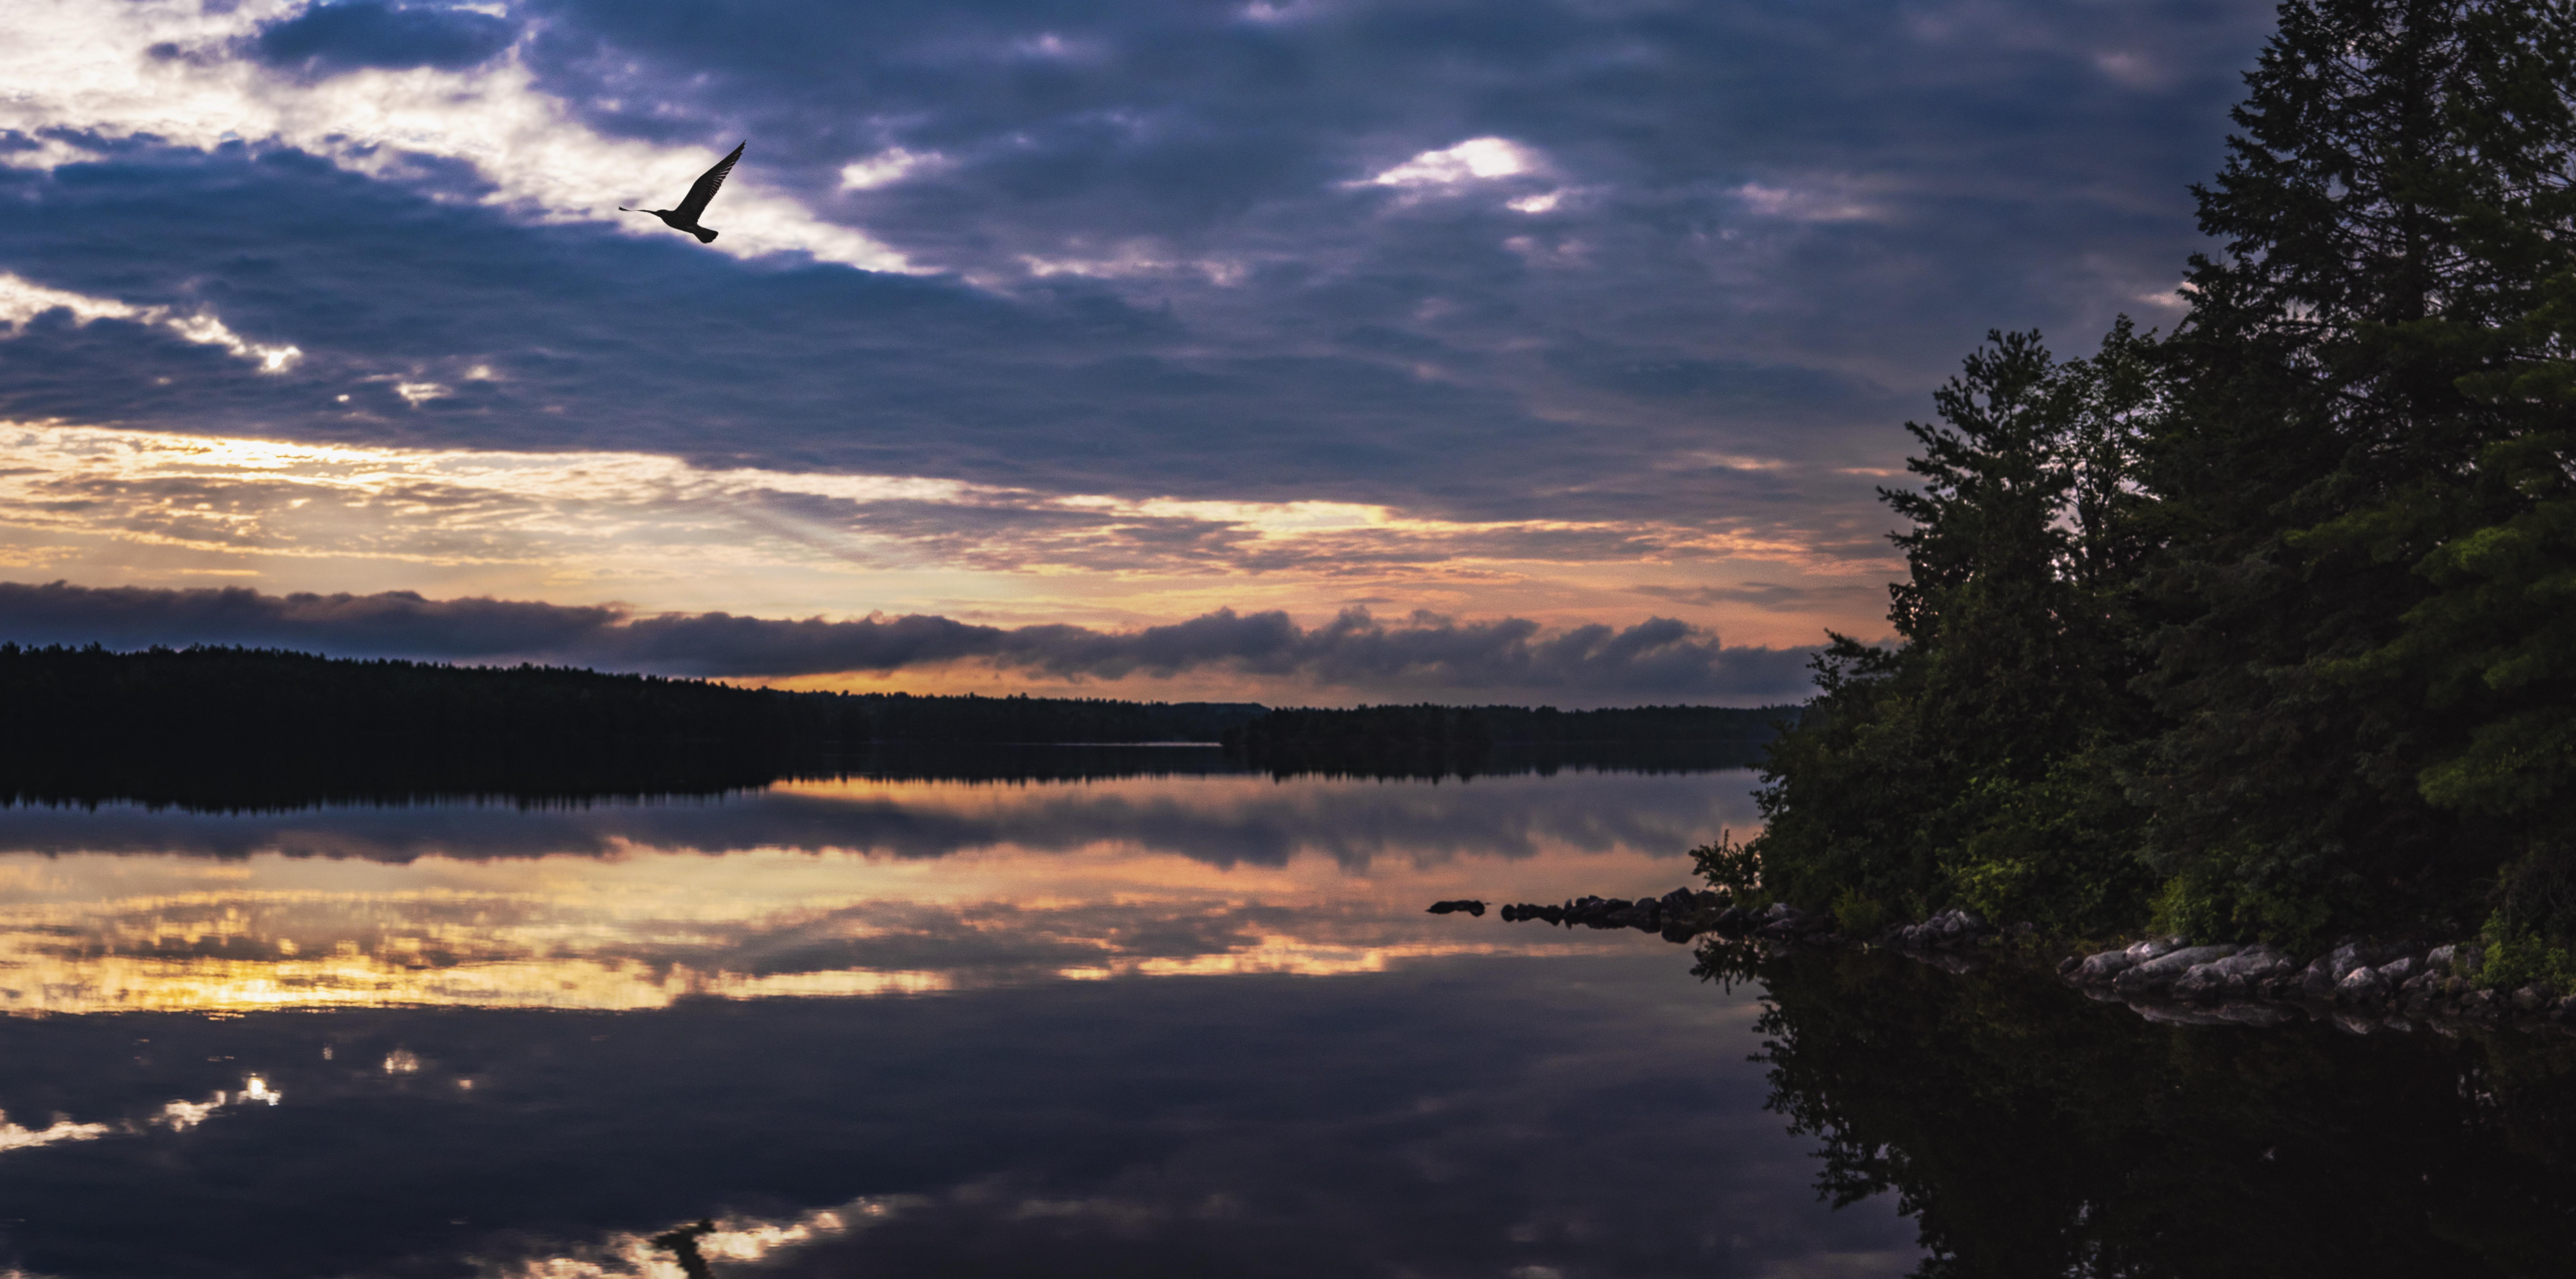 Pin By Erna Jaksic On Nature Ottawa River Sunset Quebec